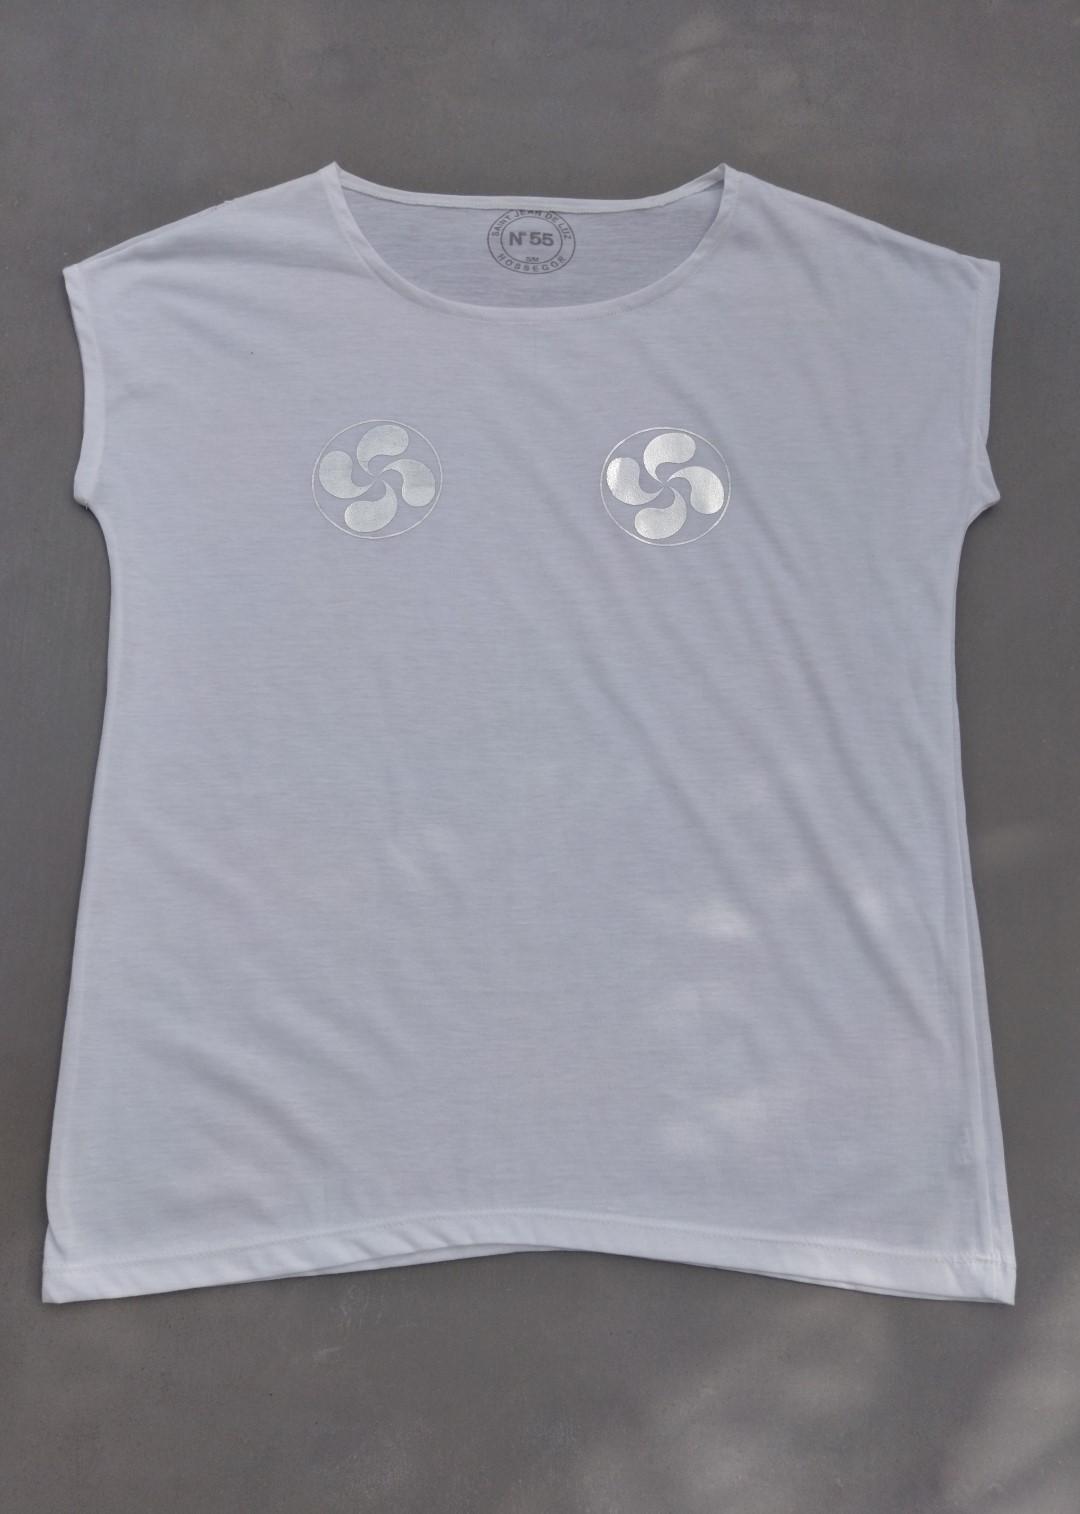 Tee shirt blanc N°55 croixbasques argent.